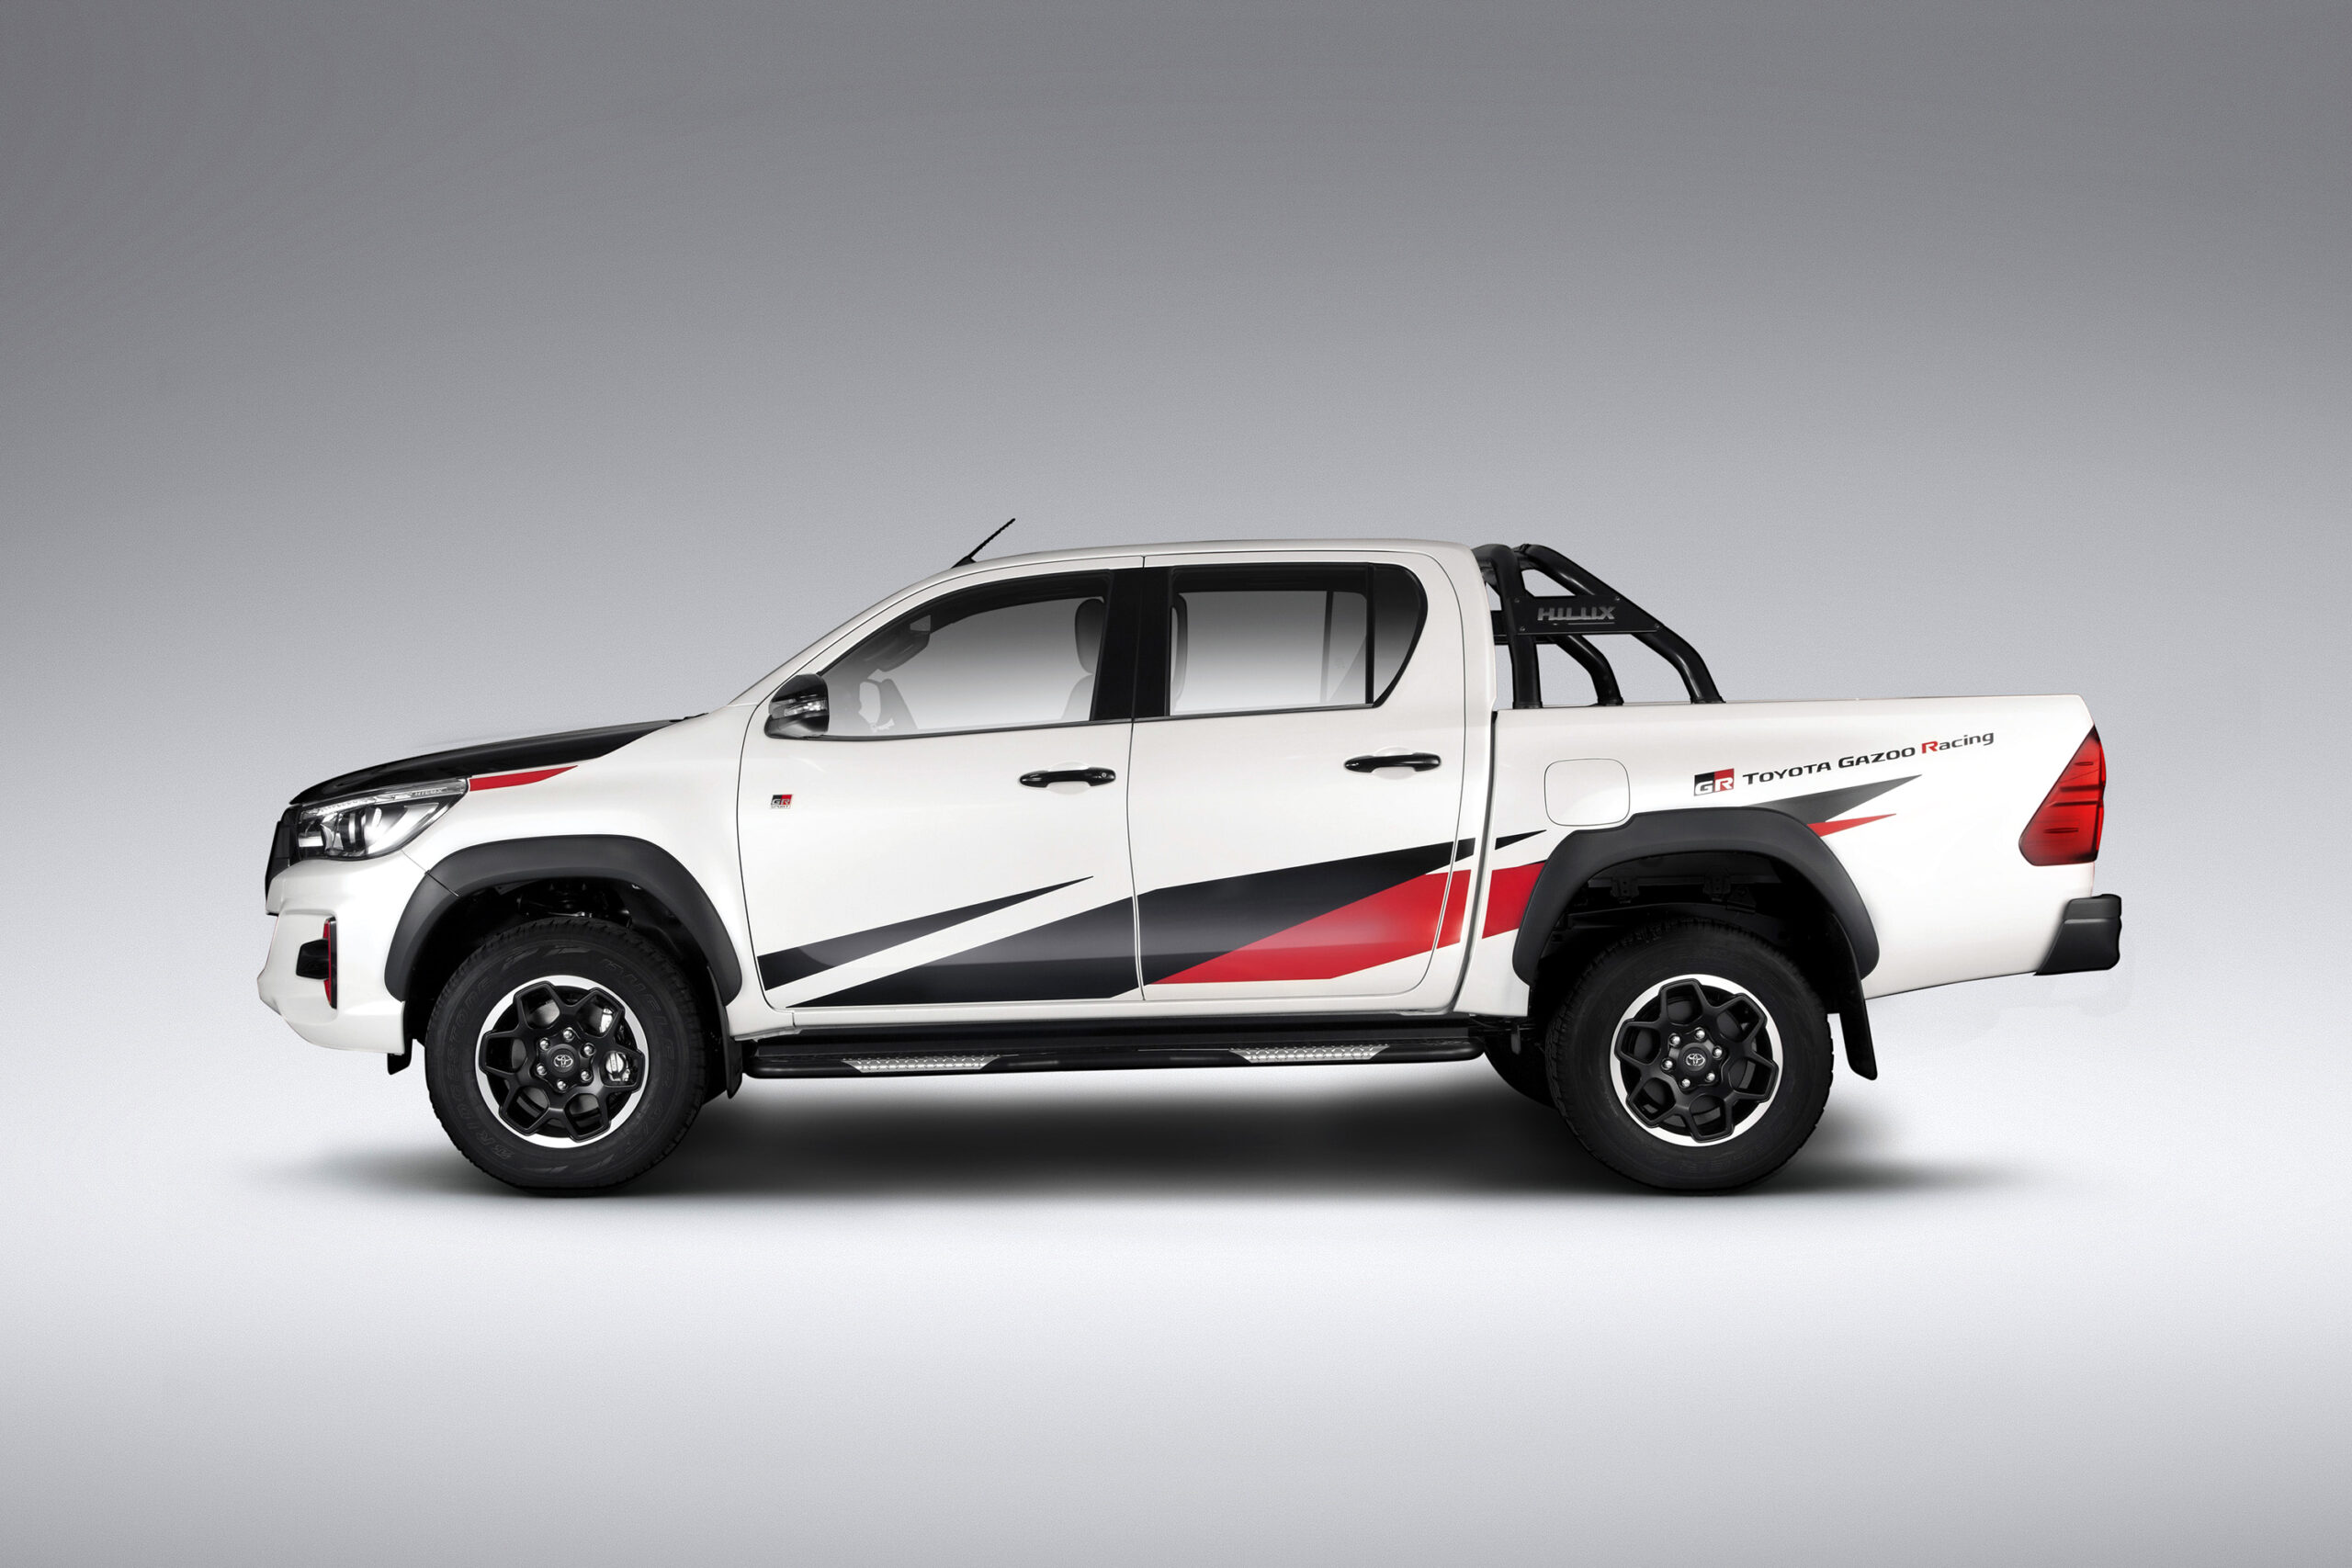 2021 Toyota Hilux Max Vs Engine Extra Europe Emotional